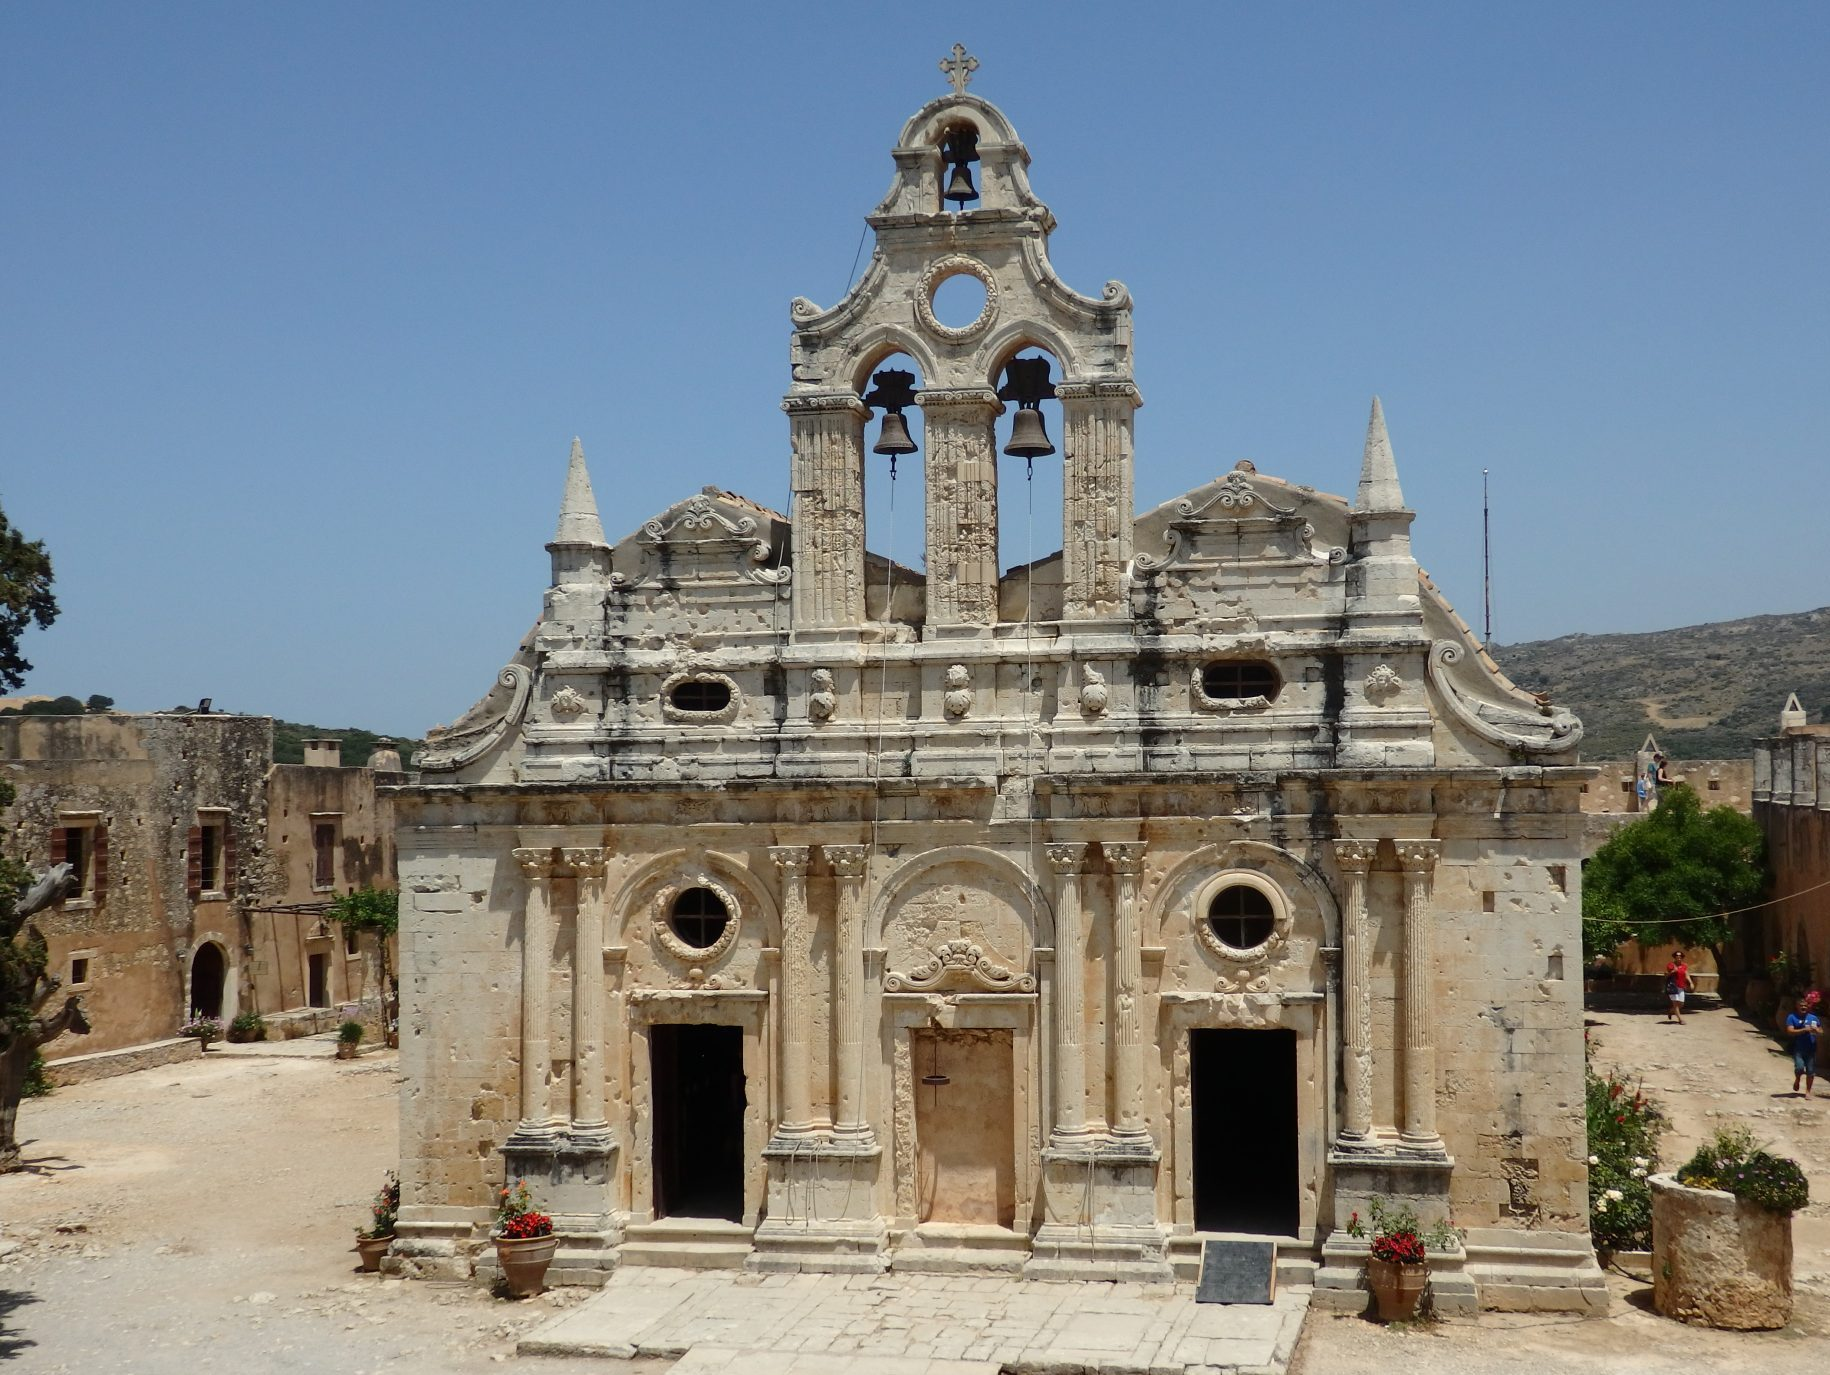 The church at Arkadi monastery in Crete